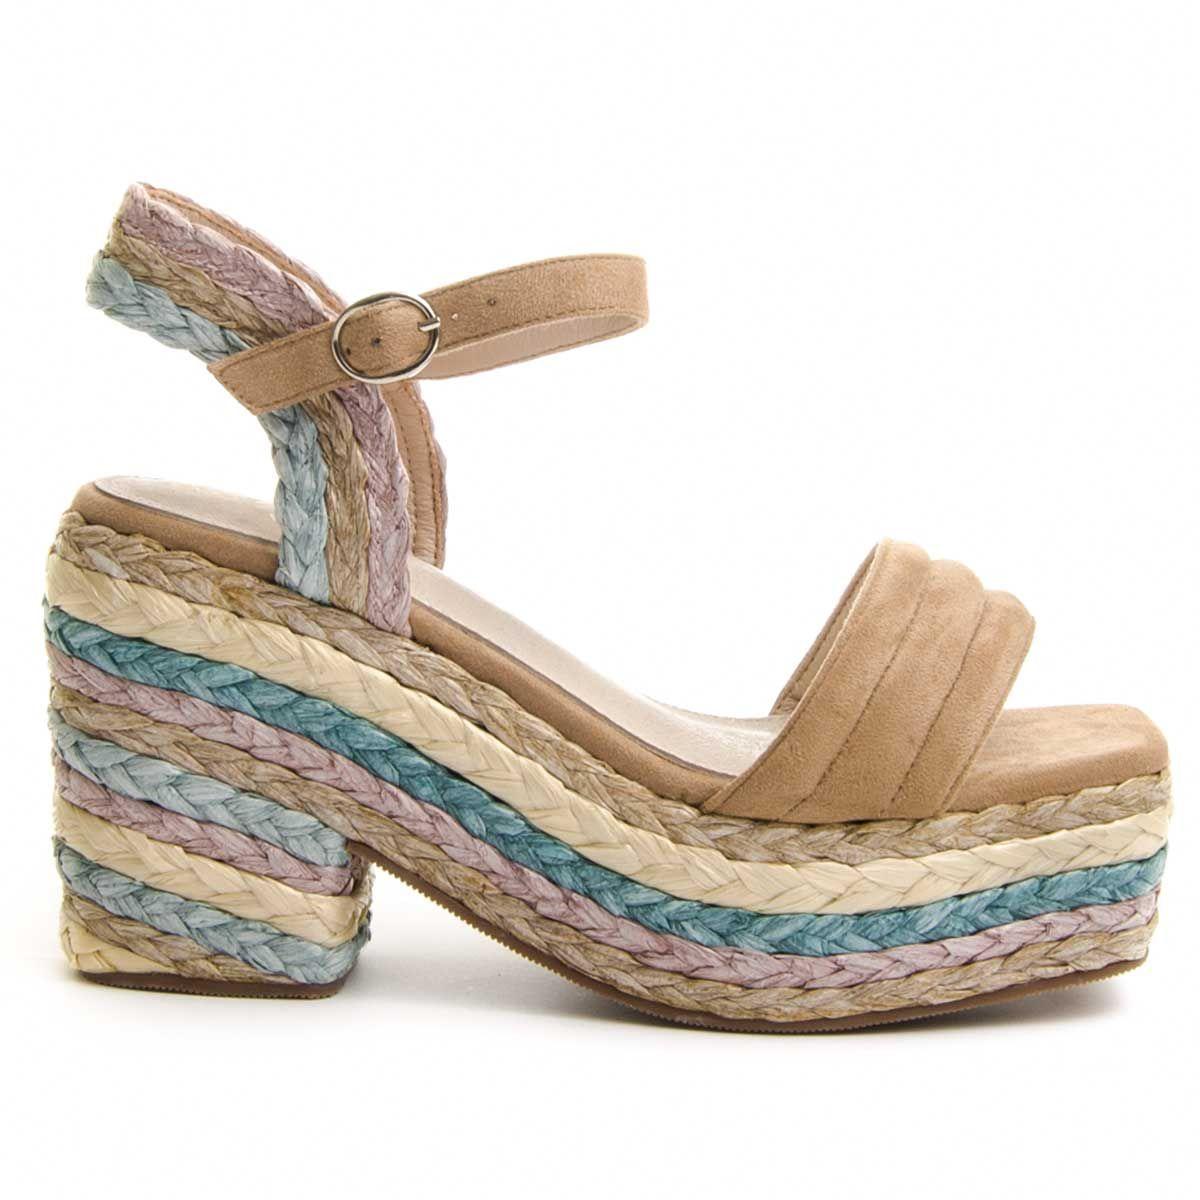 Montevita Platform Sandal in Multicolour